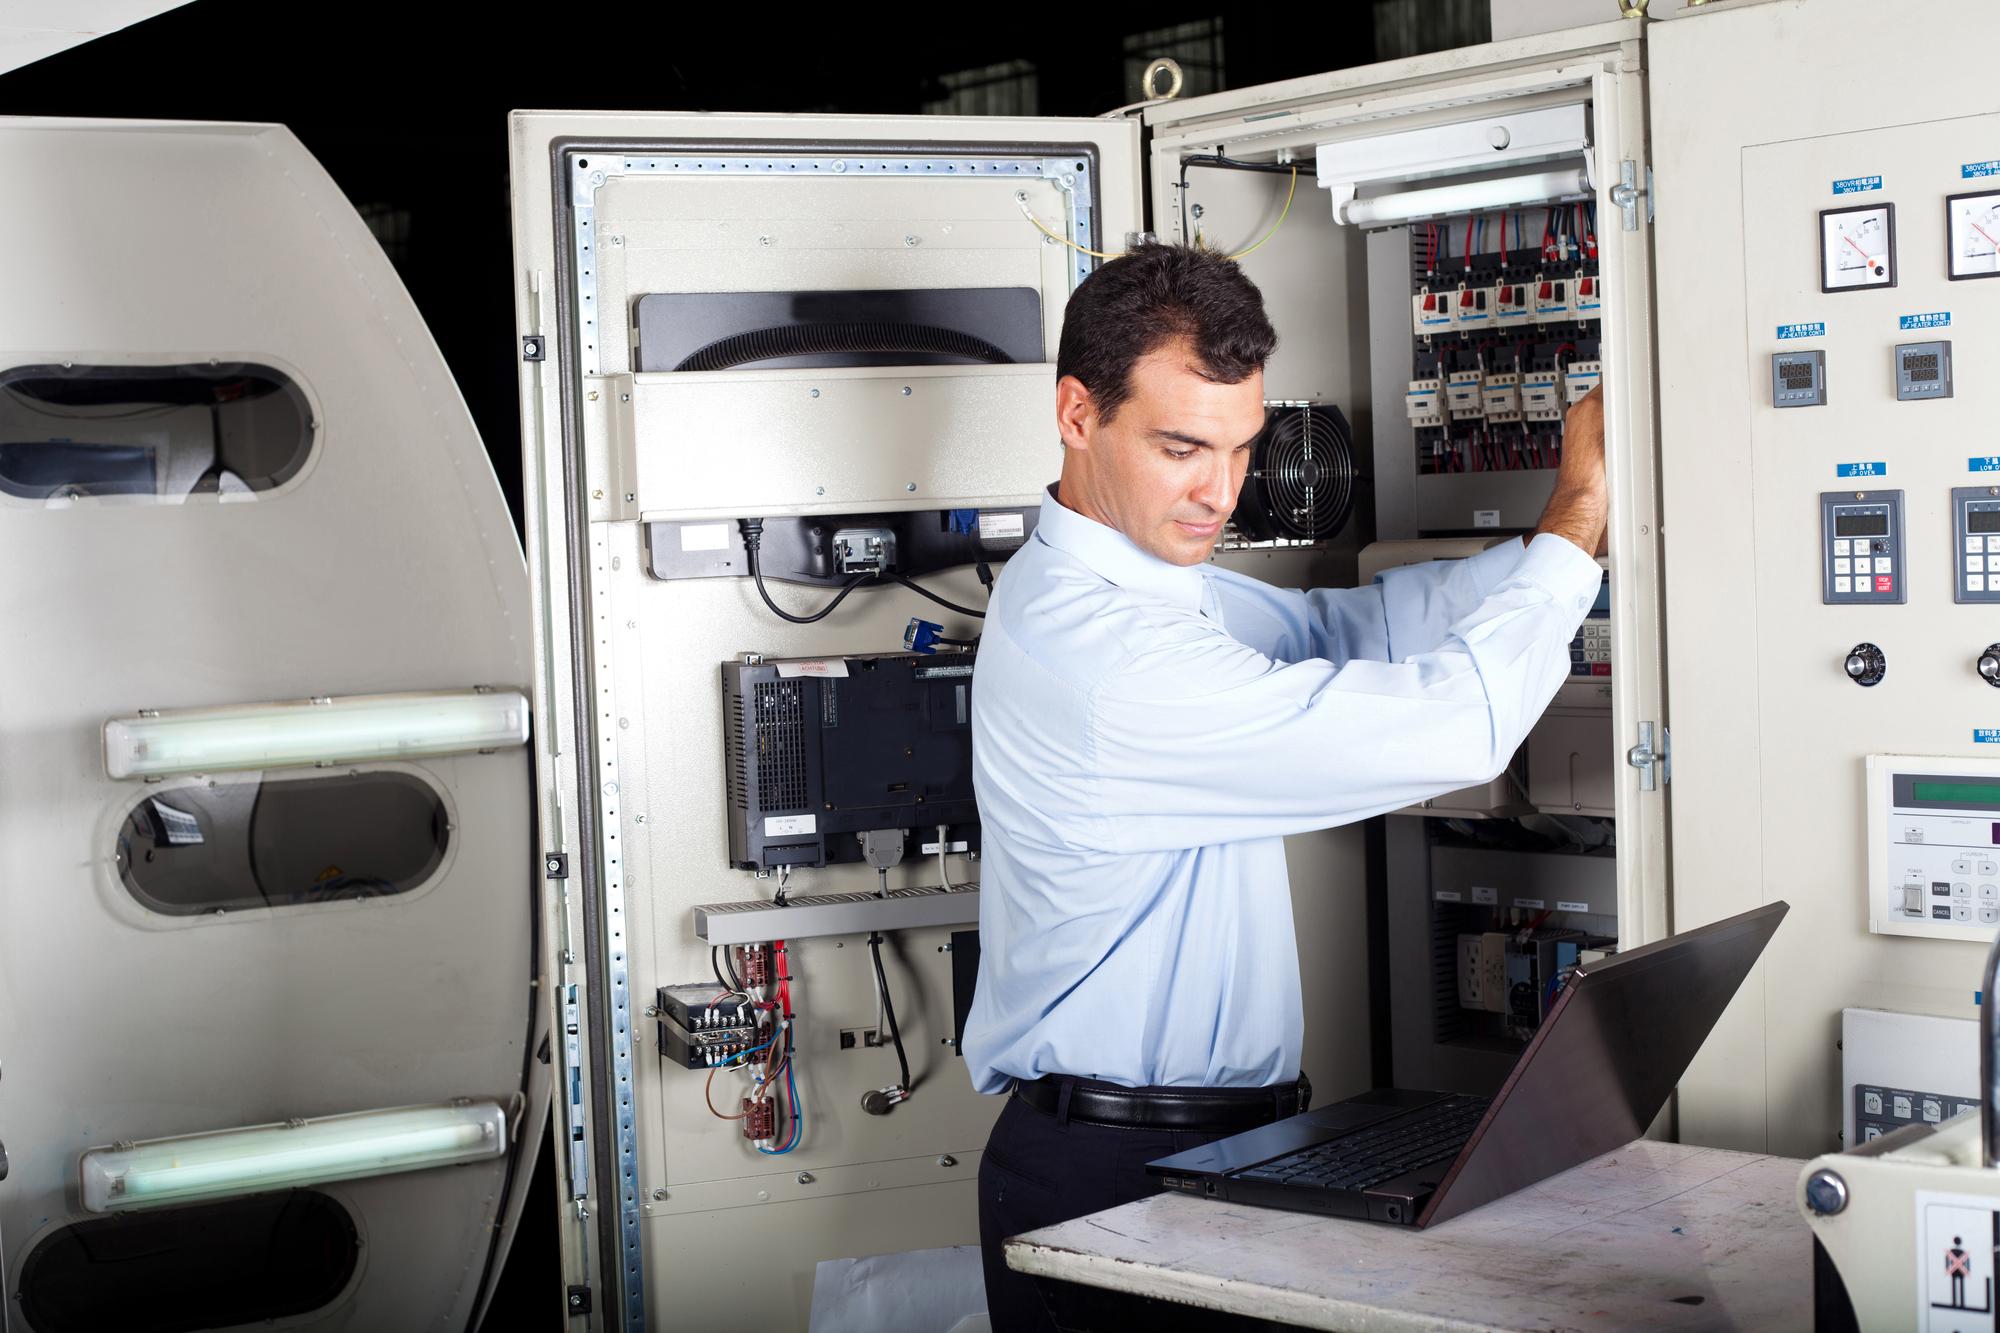 industrial technician repairing modern computerized machine in factory